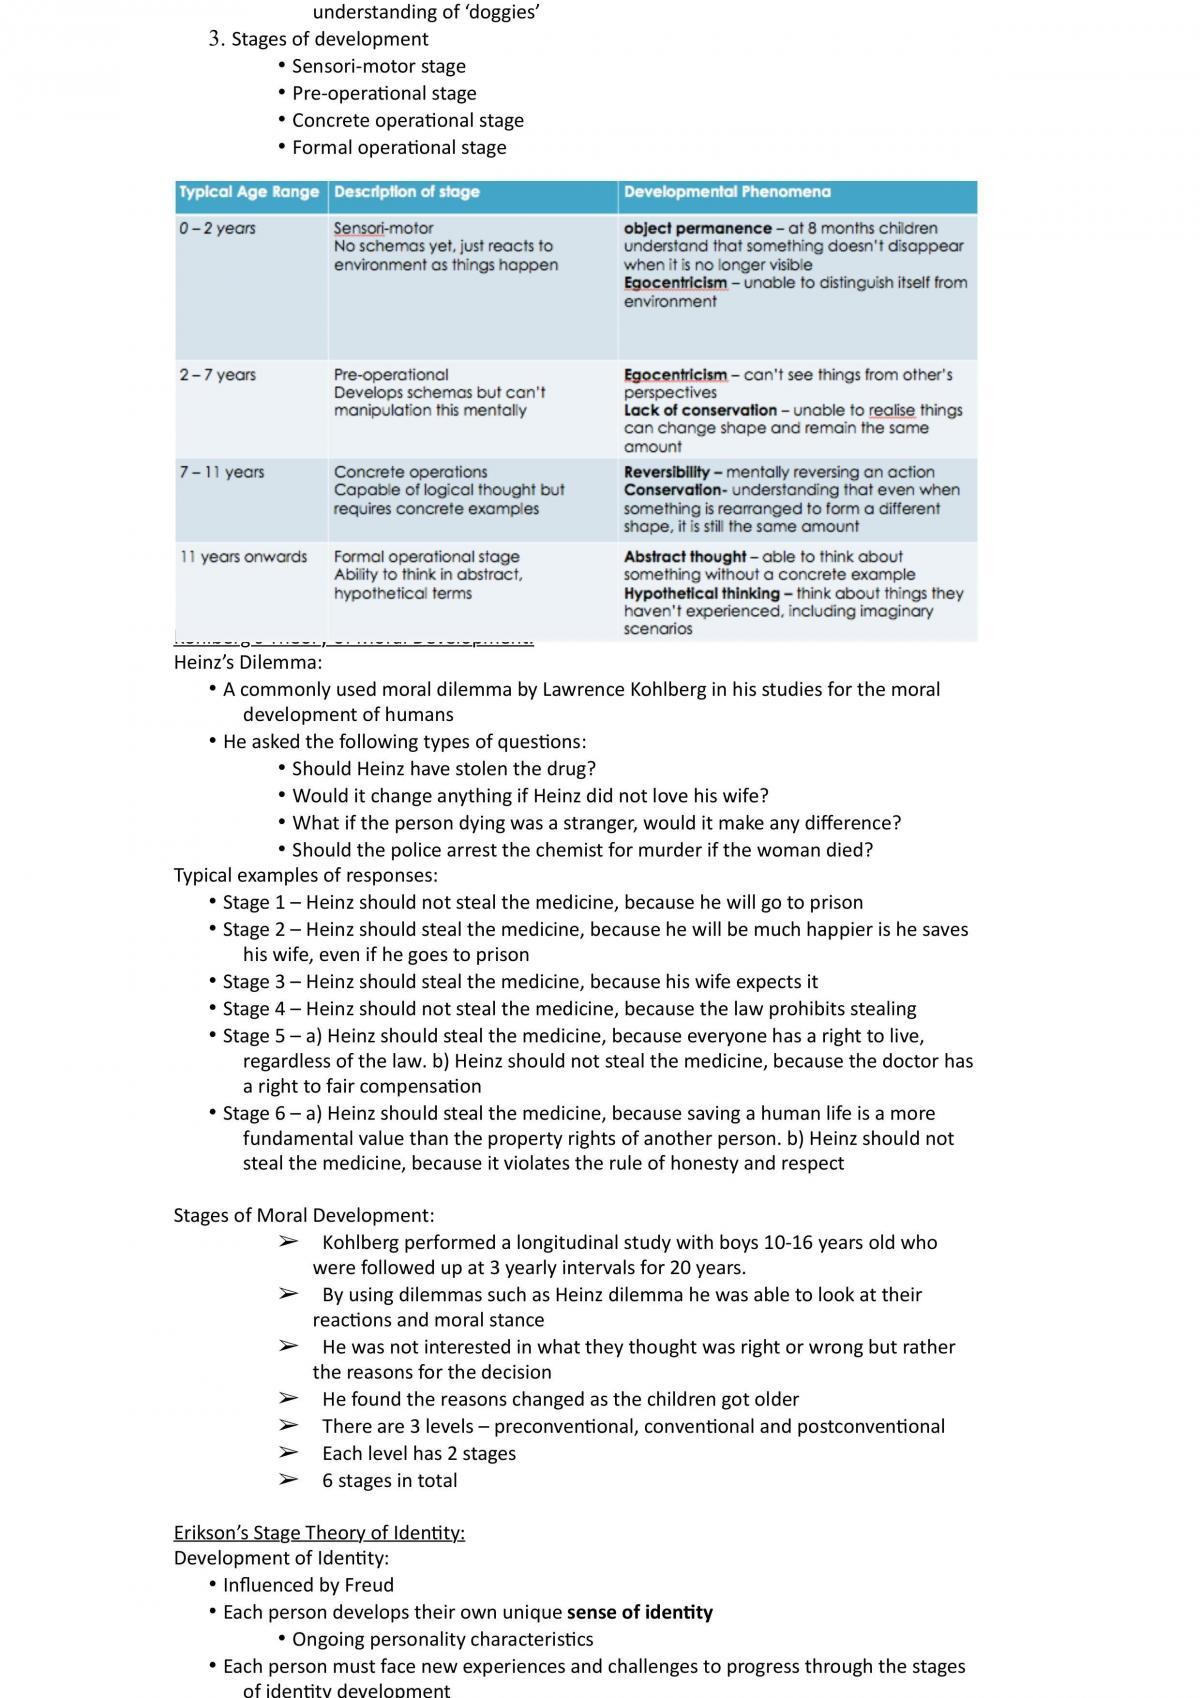 Psychology Unit 3&4 Notes - Page 19